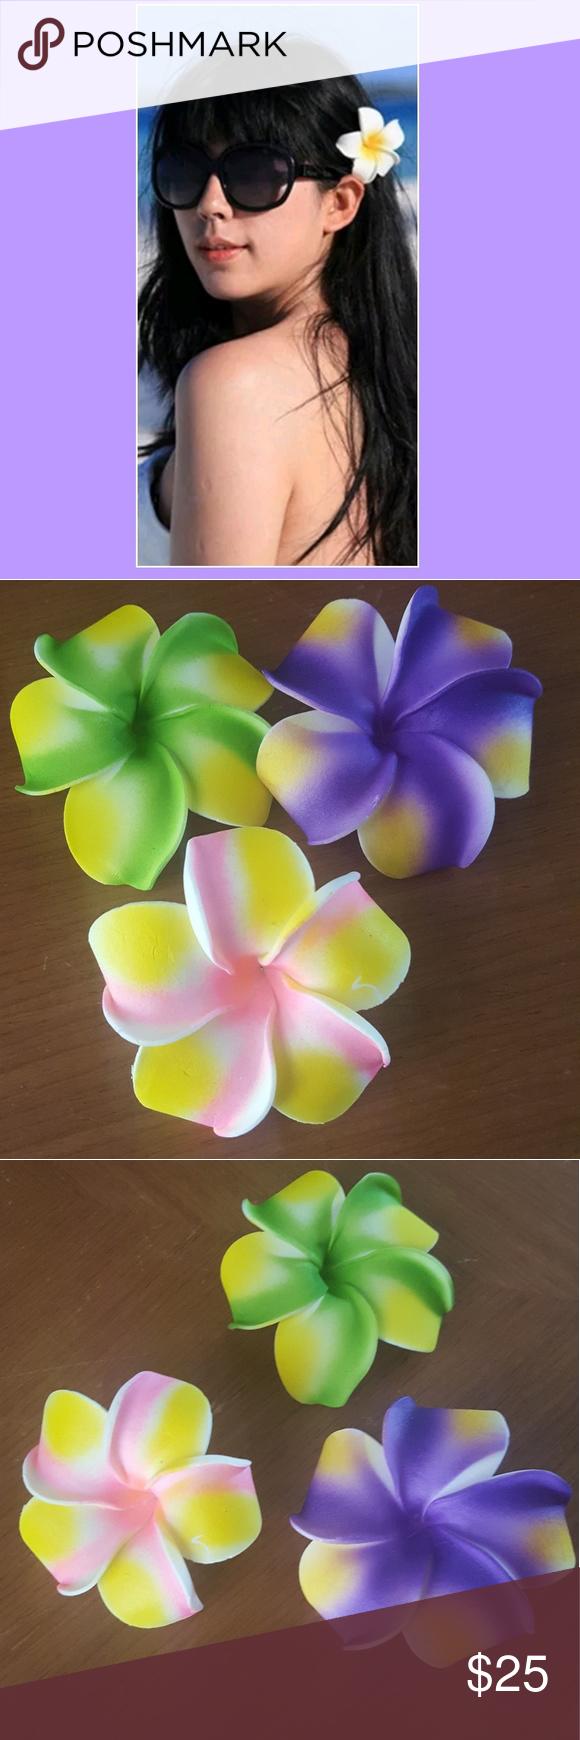 3 hawaiian flower hair clips boutique hawaiian flower hair 3 hawaiian flower hair clips flower placement in your hair actually has a meaning proper izmirmasajfo